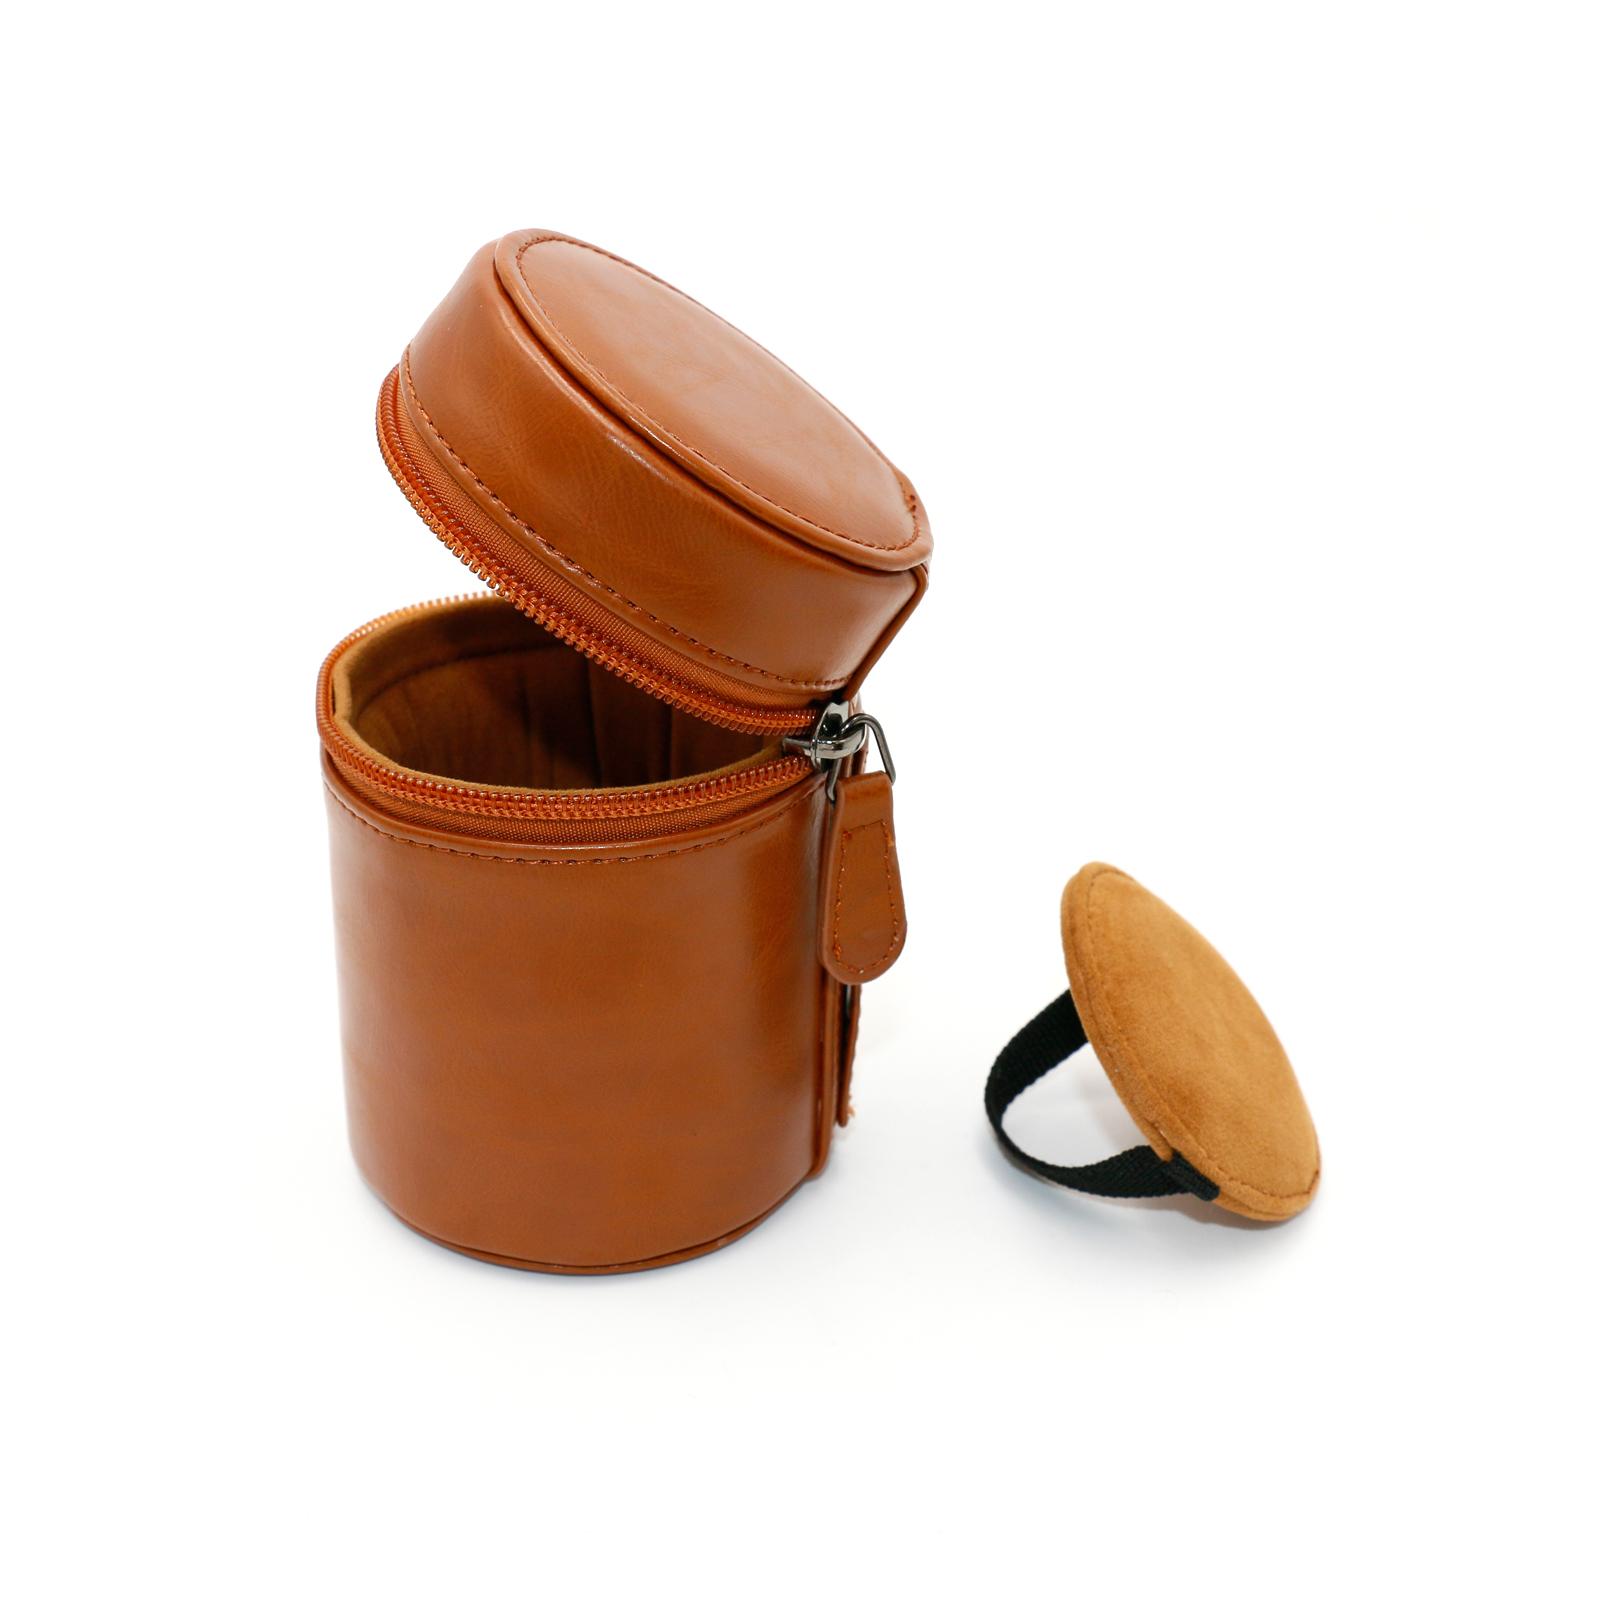 Труба один перевернутый камера объектив трубка объектив пакет / мешок объектив кожа баррель кобура защита авария карман / жесткий